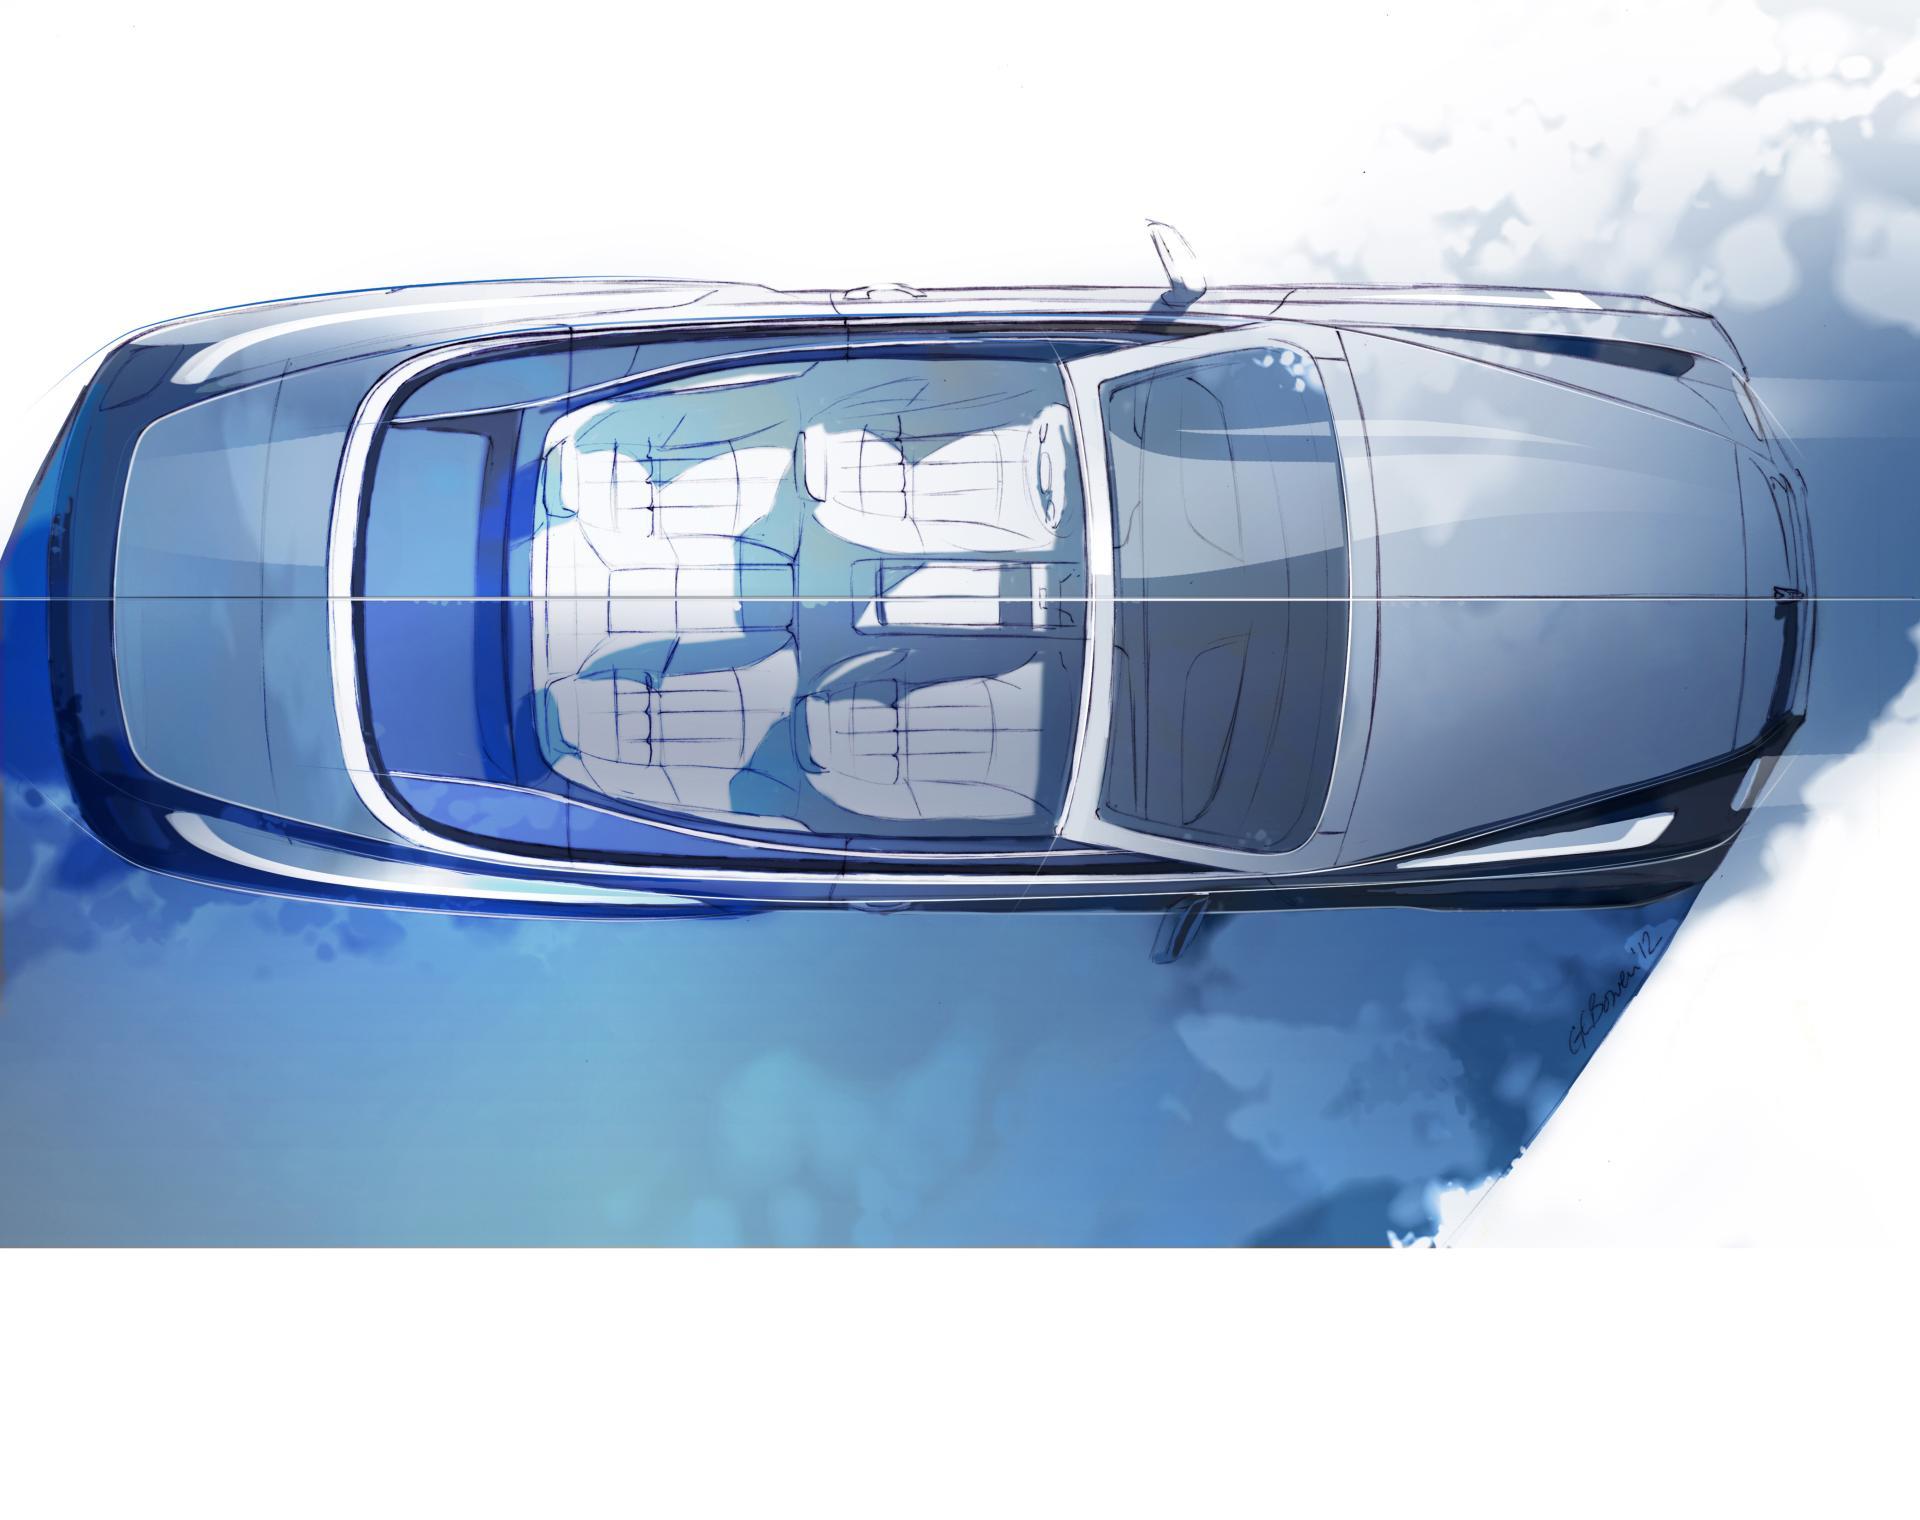 2012 Bentley Mulsanne Convertible Concept